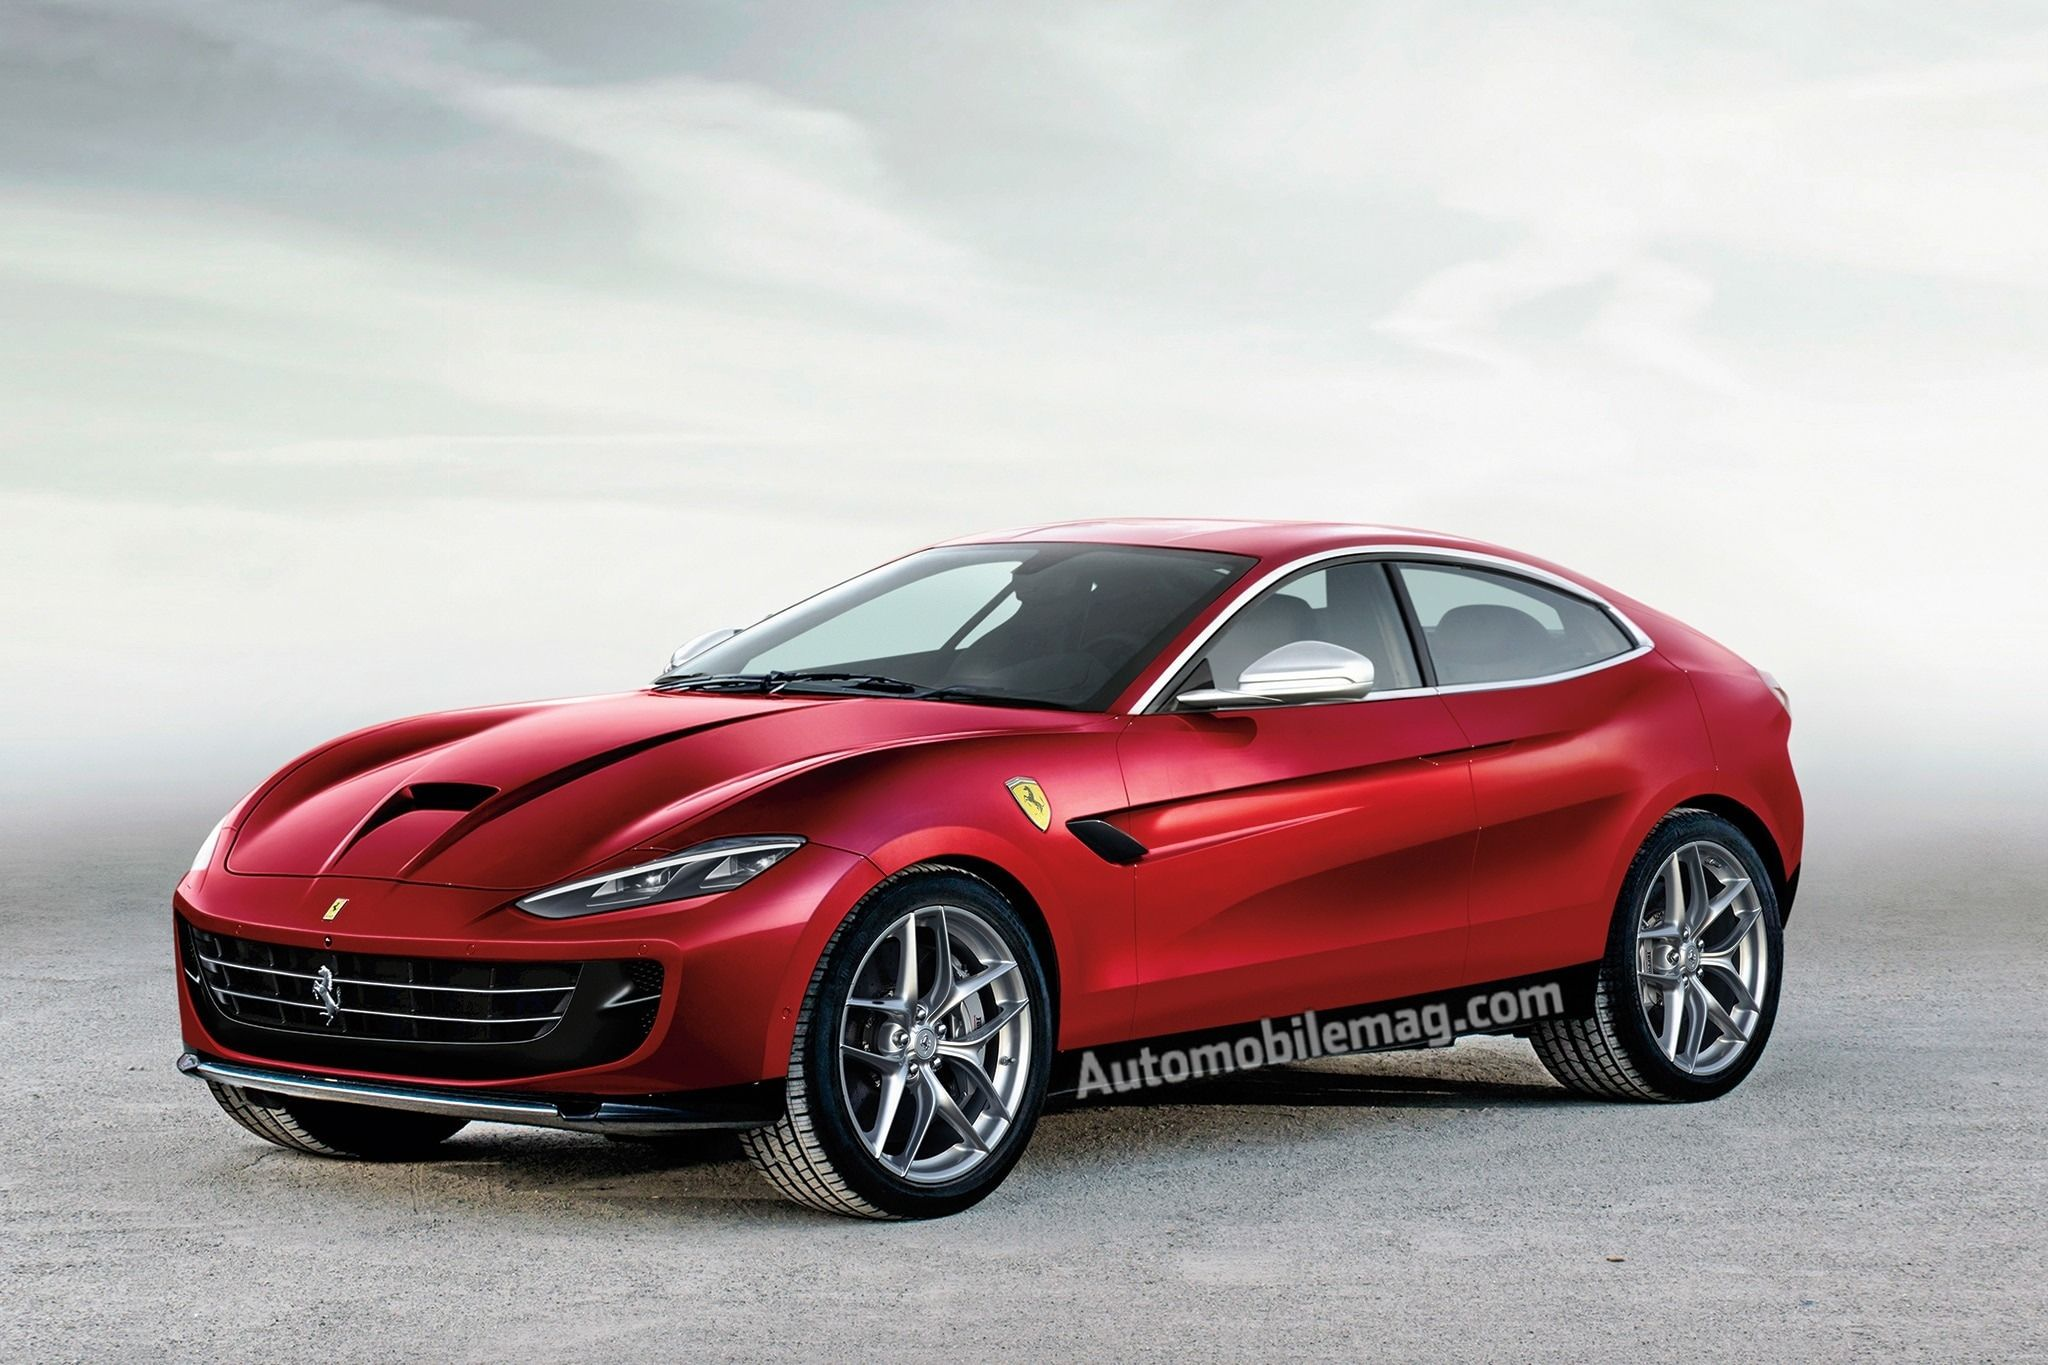 2019 Ferrari Suv New Interior Mobil Mewah Mobil